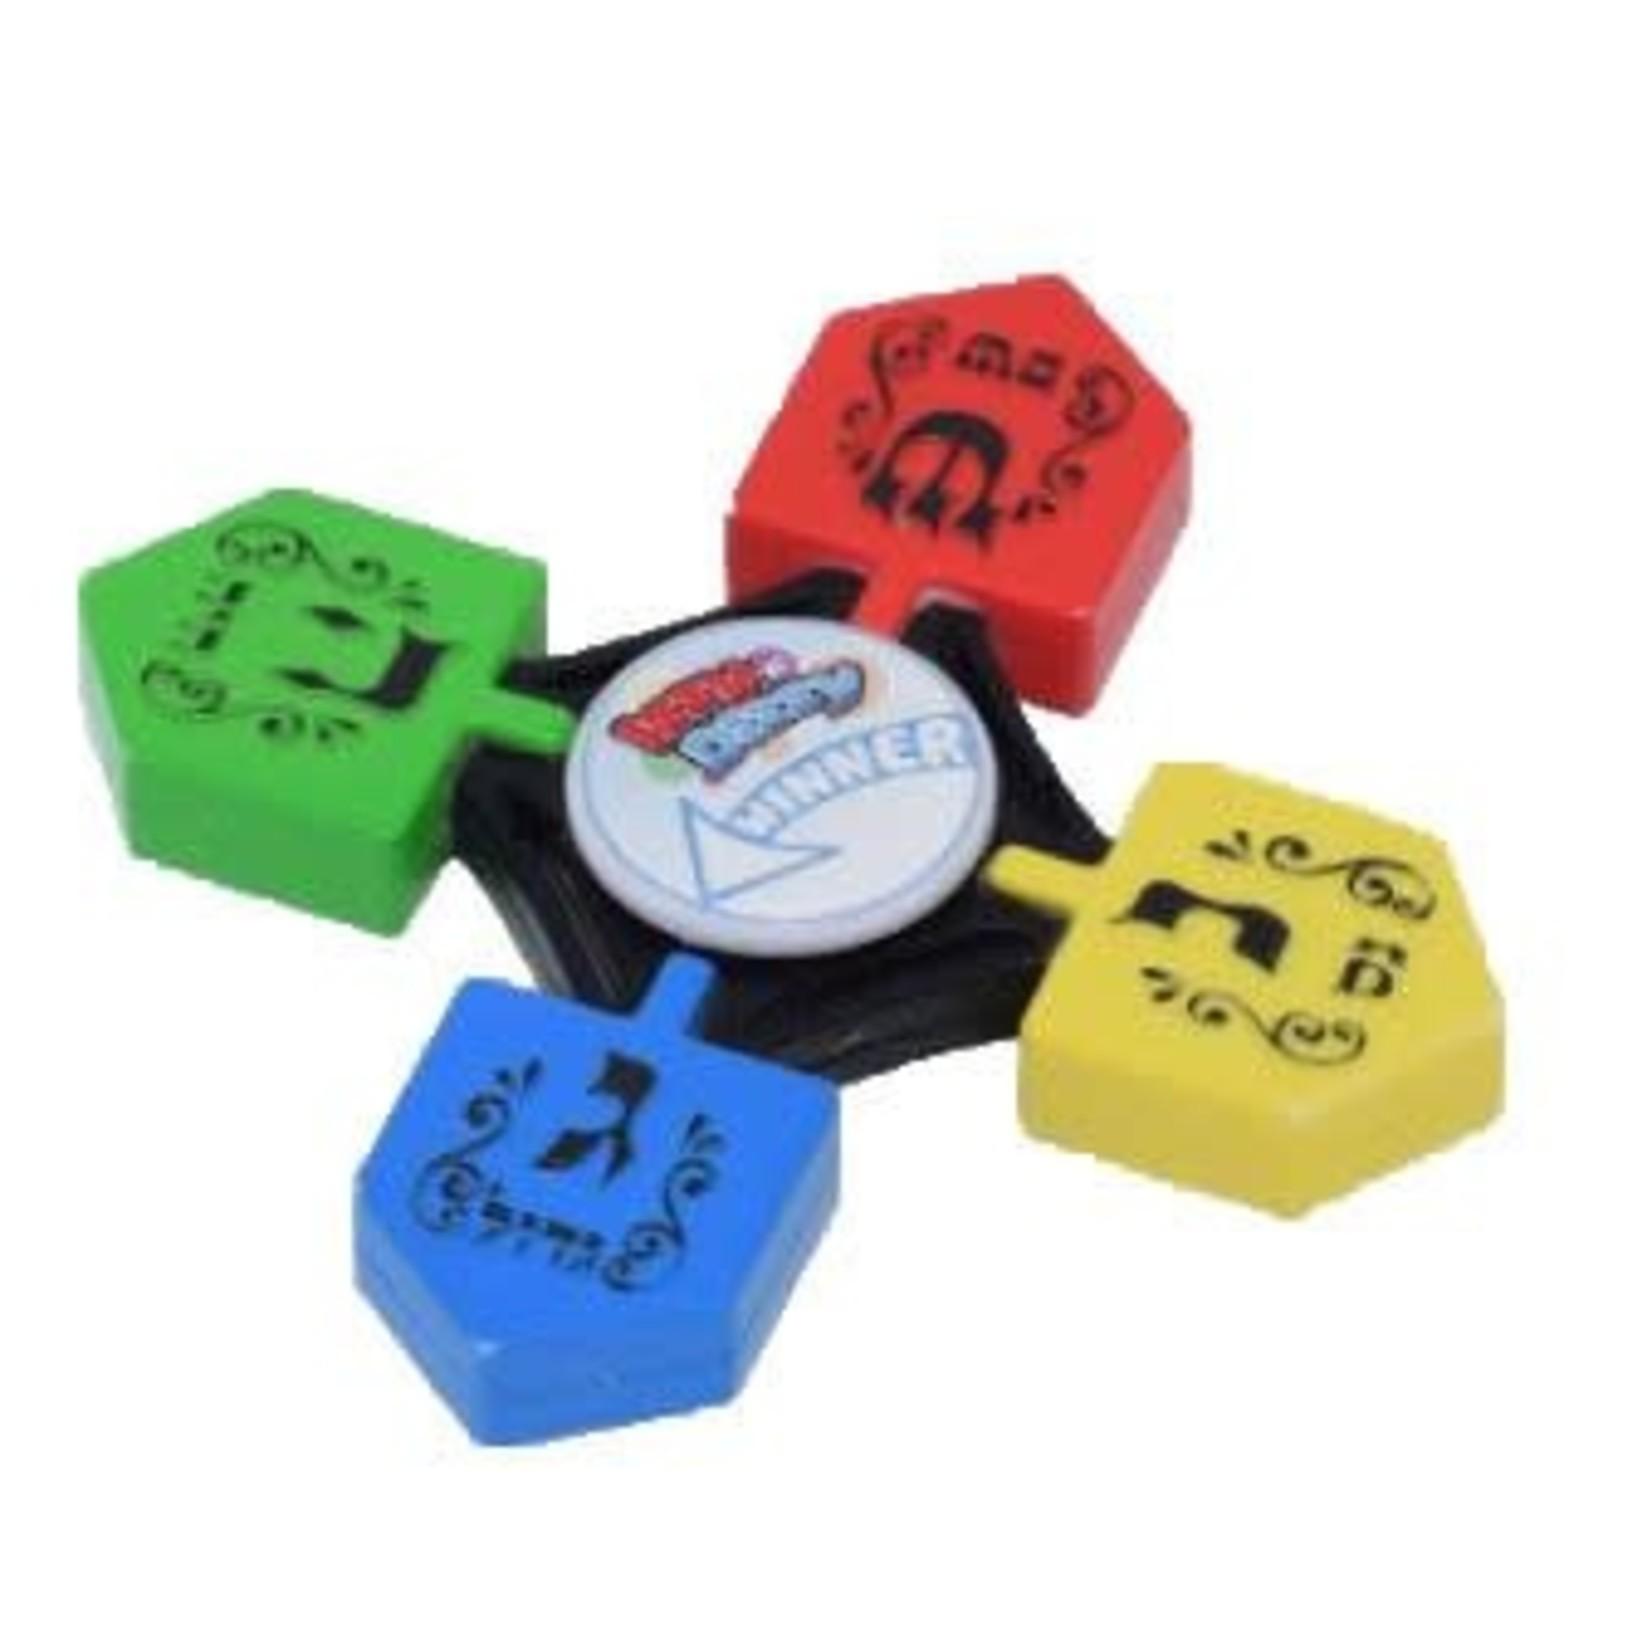 24 X Dreidel Spinners - Multi Colored